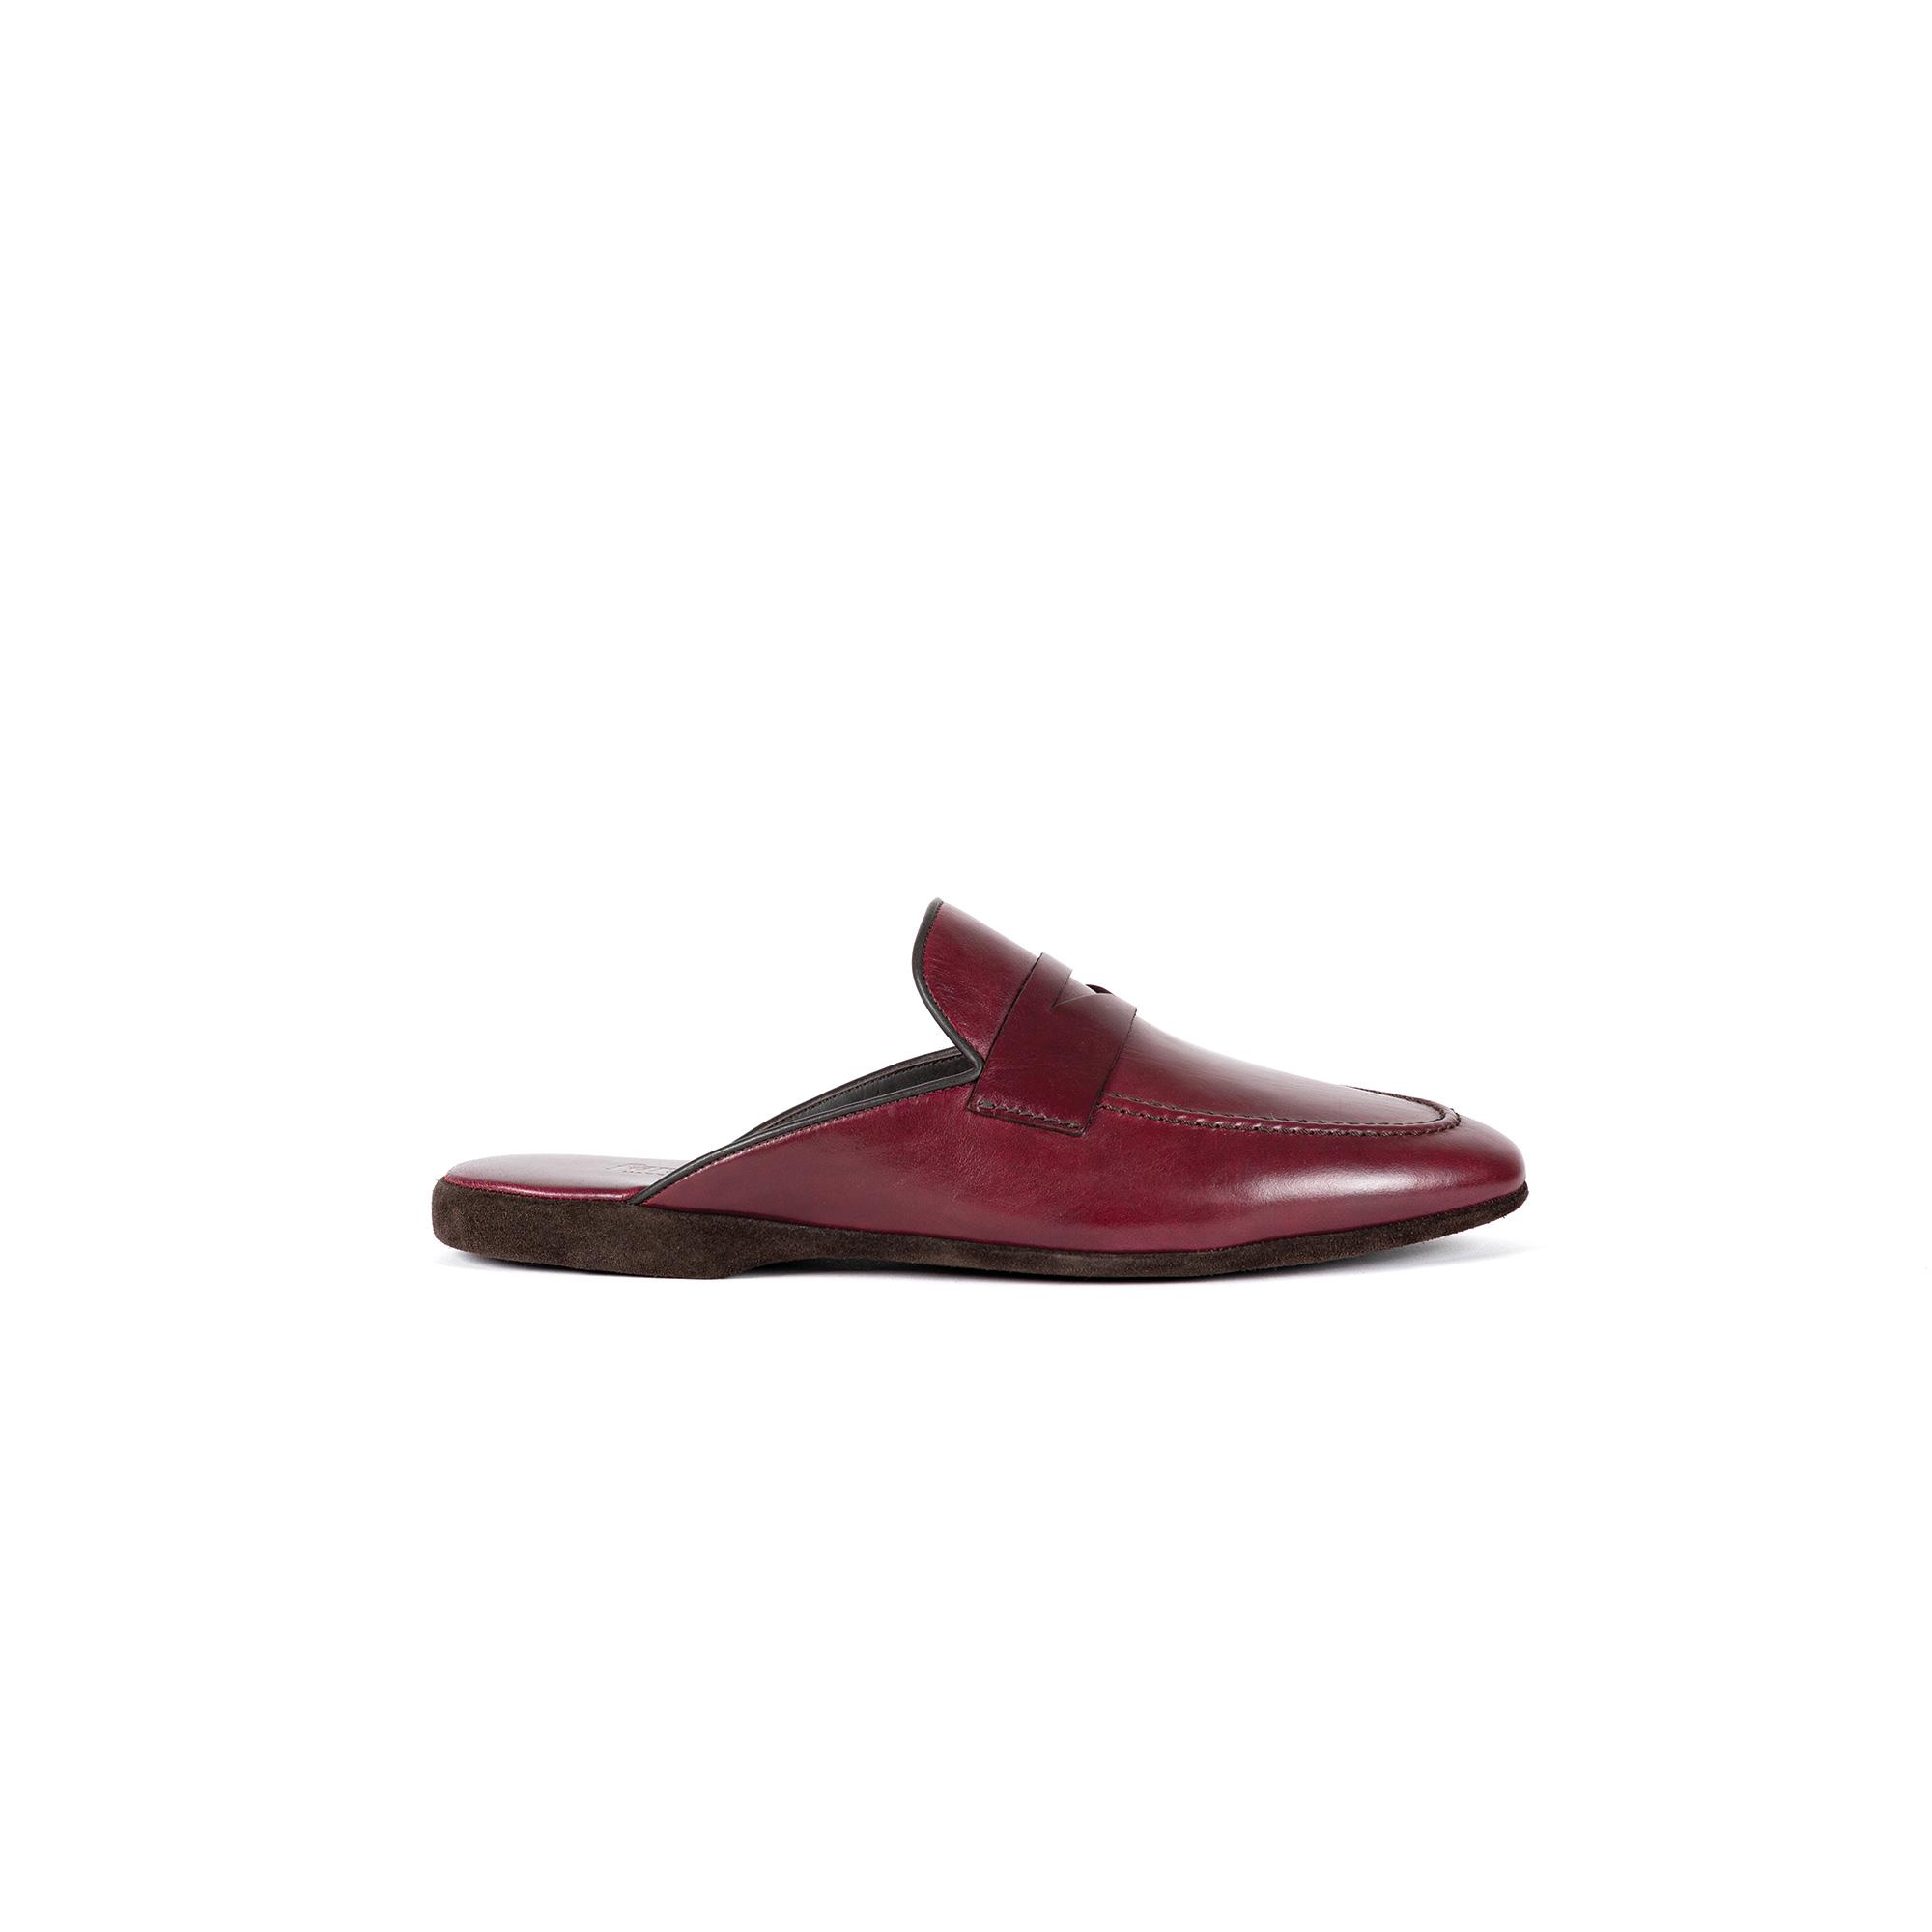 Pantofola interno classico in pelle vitello bordeaux - Farfalla italian slippers